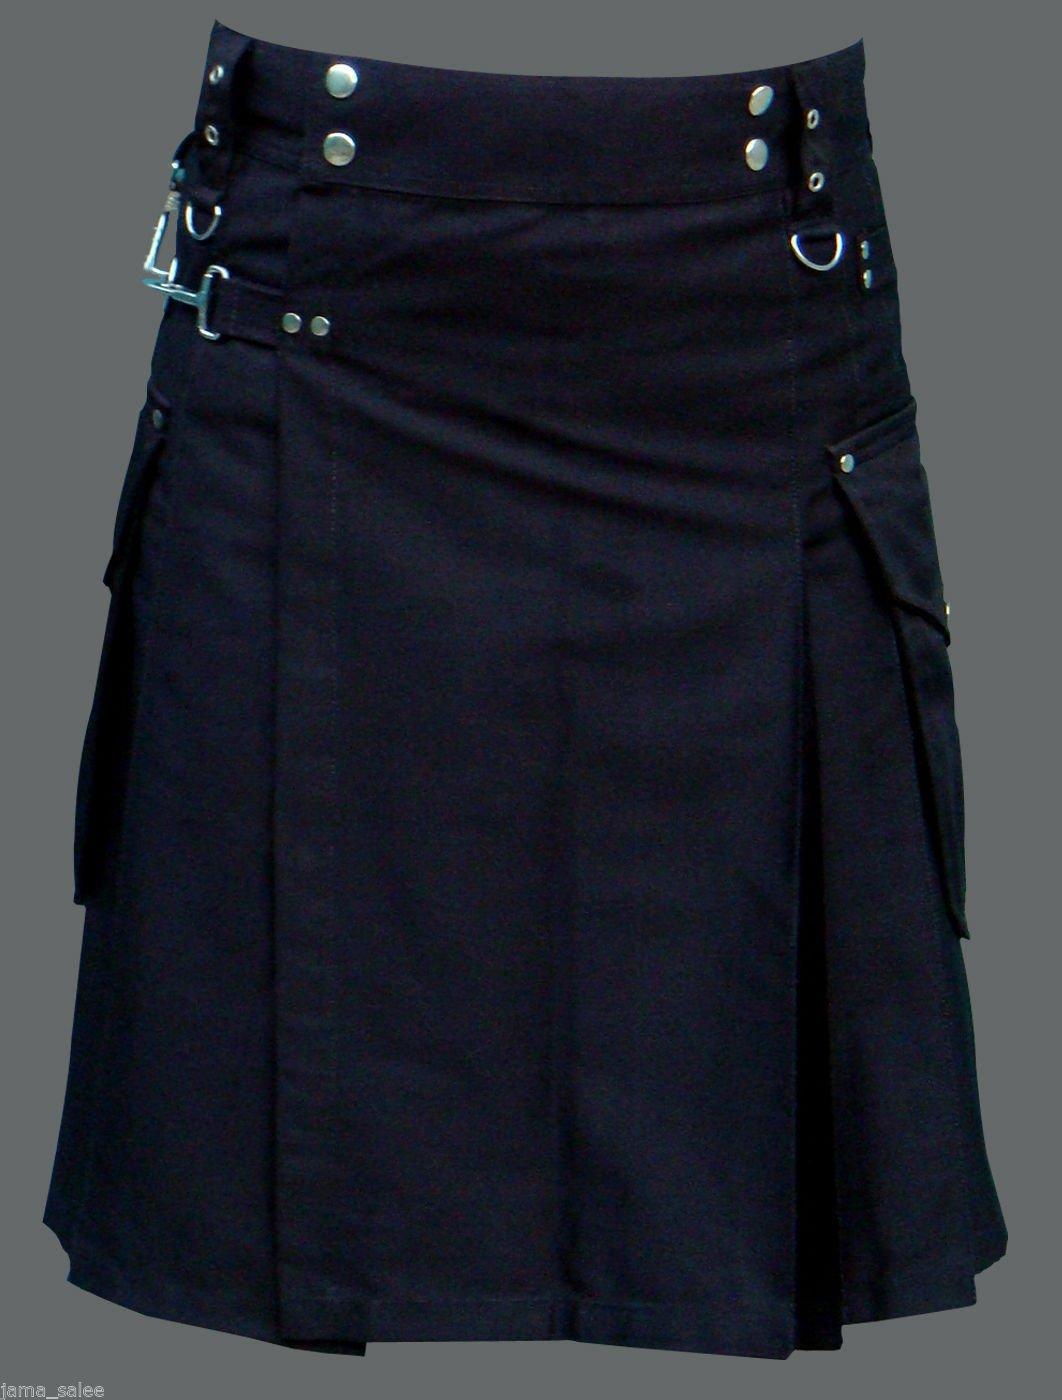 Men 58 Waist Handmade Black Deluxe Utility Kilt 100% Cotton With Cargo Pockets